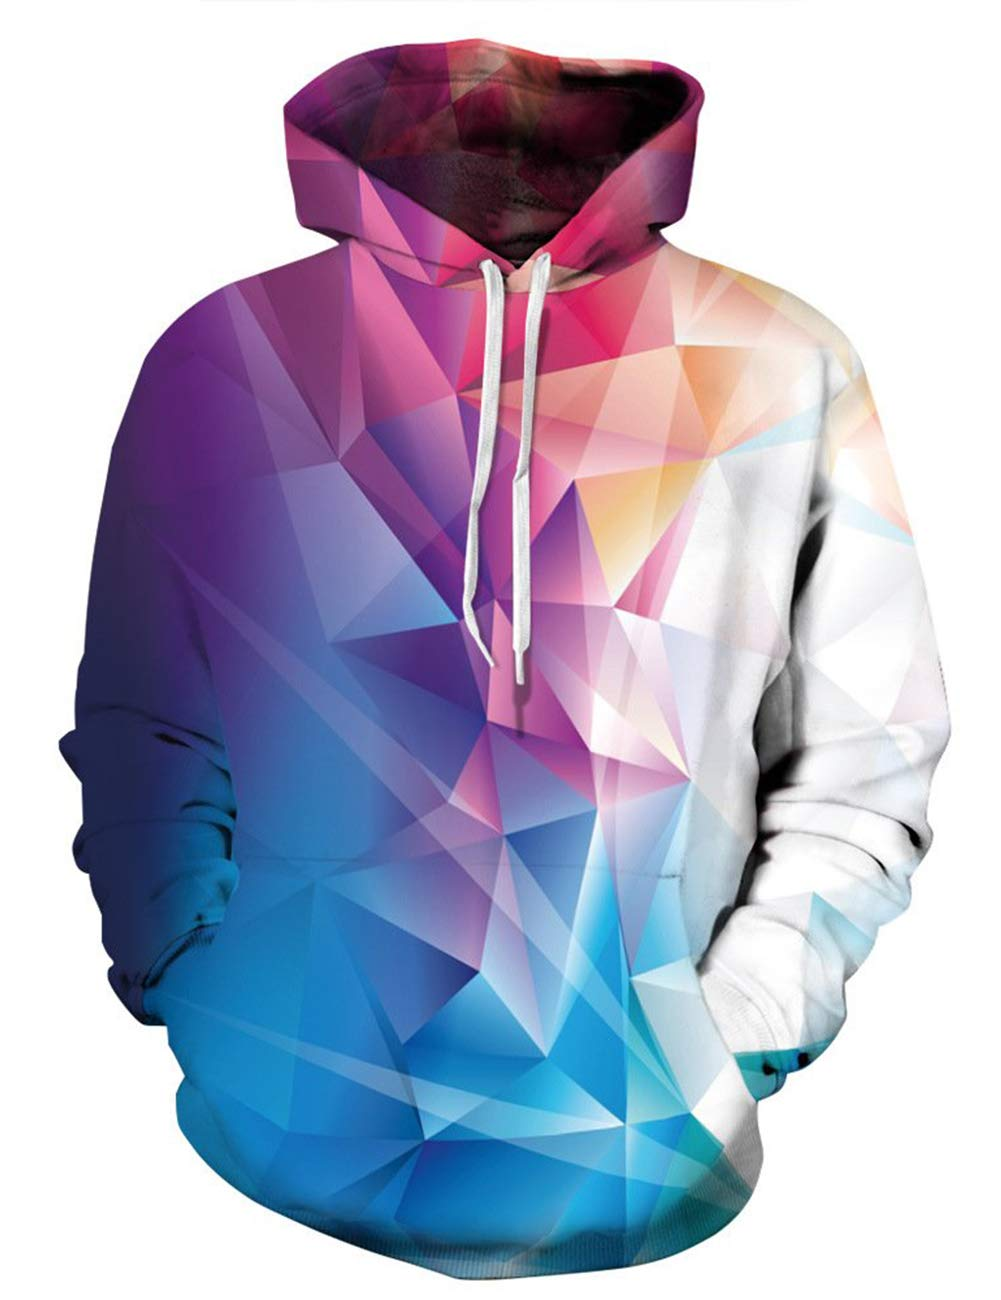 Fanient Unisex 3D Diamond Print Hoodie Novelty Sweatshirt Pullover Hooded Stretch Hoodies